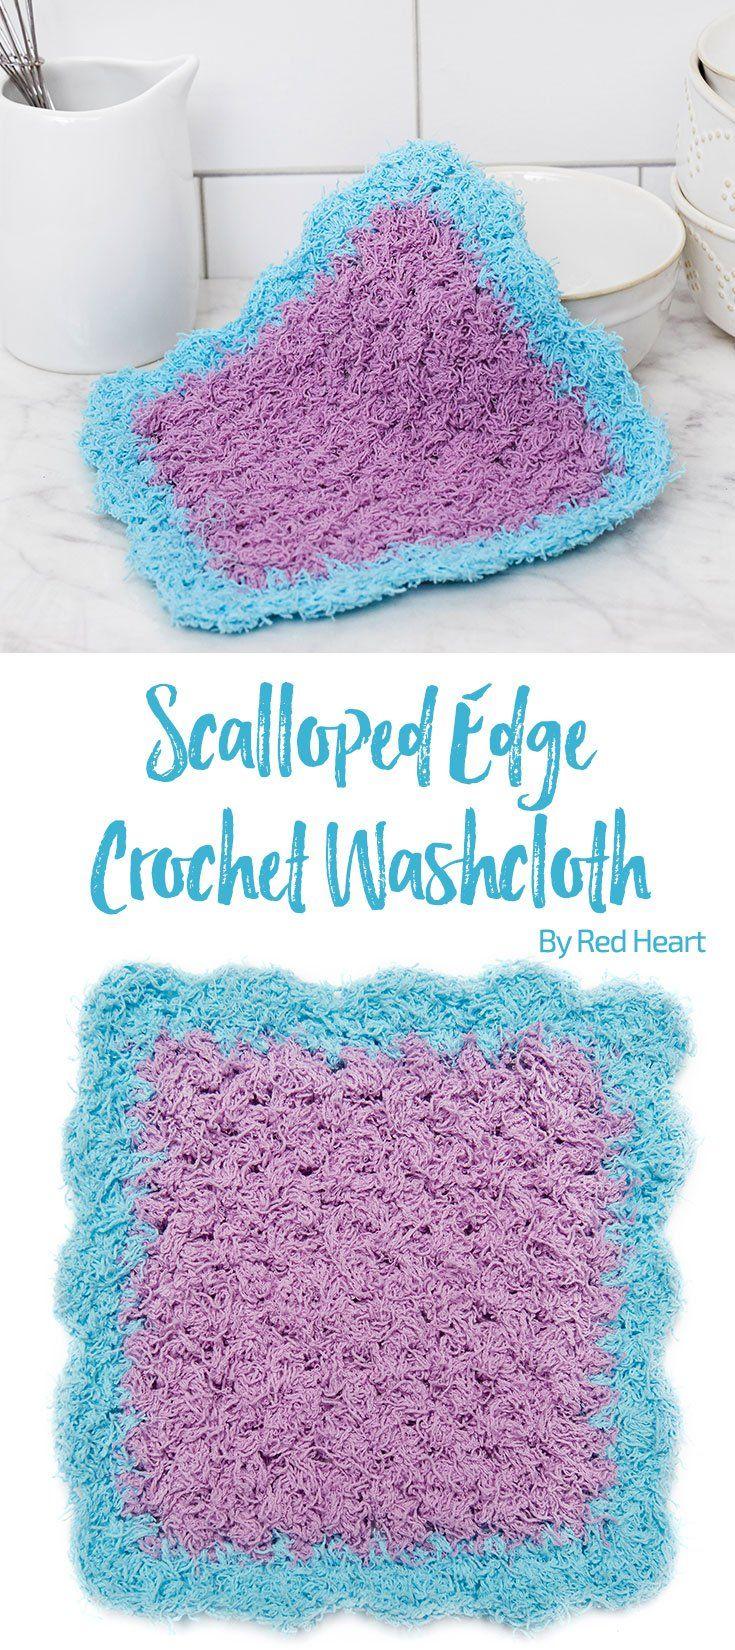 Best 25 crochet scalloped edge ideas on pinterest shell edging scalloped edge crochet washcloth free crochet pattern in scrubby cotton yarn bankloansurffo Images